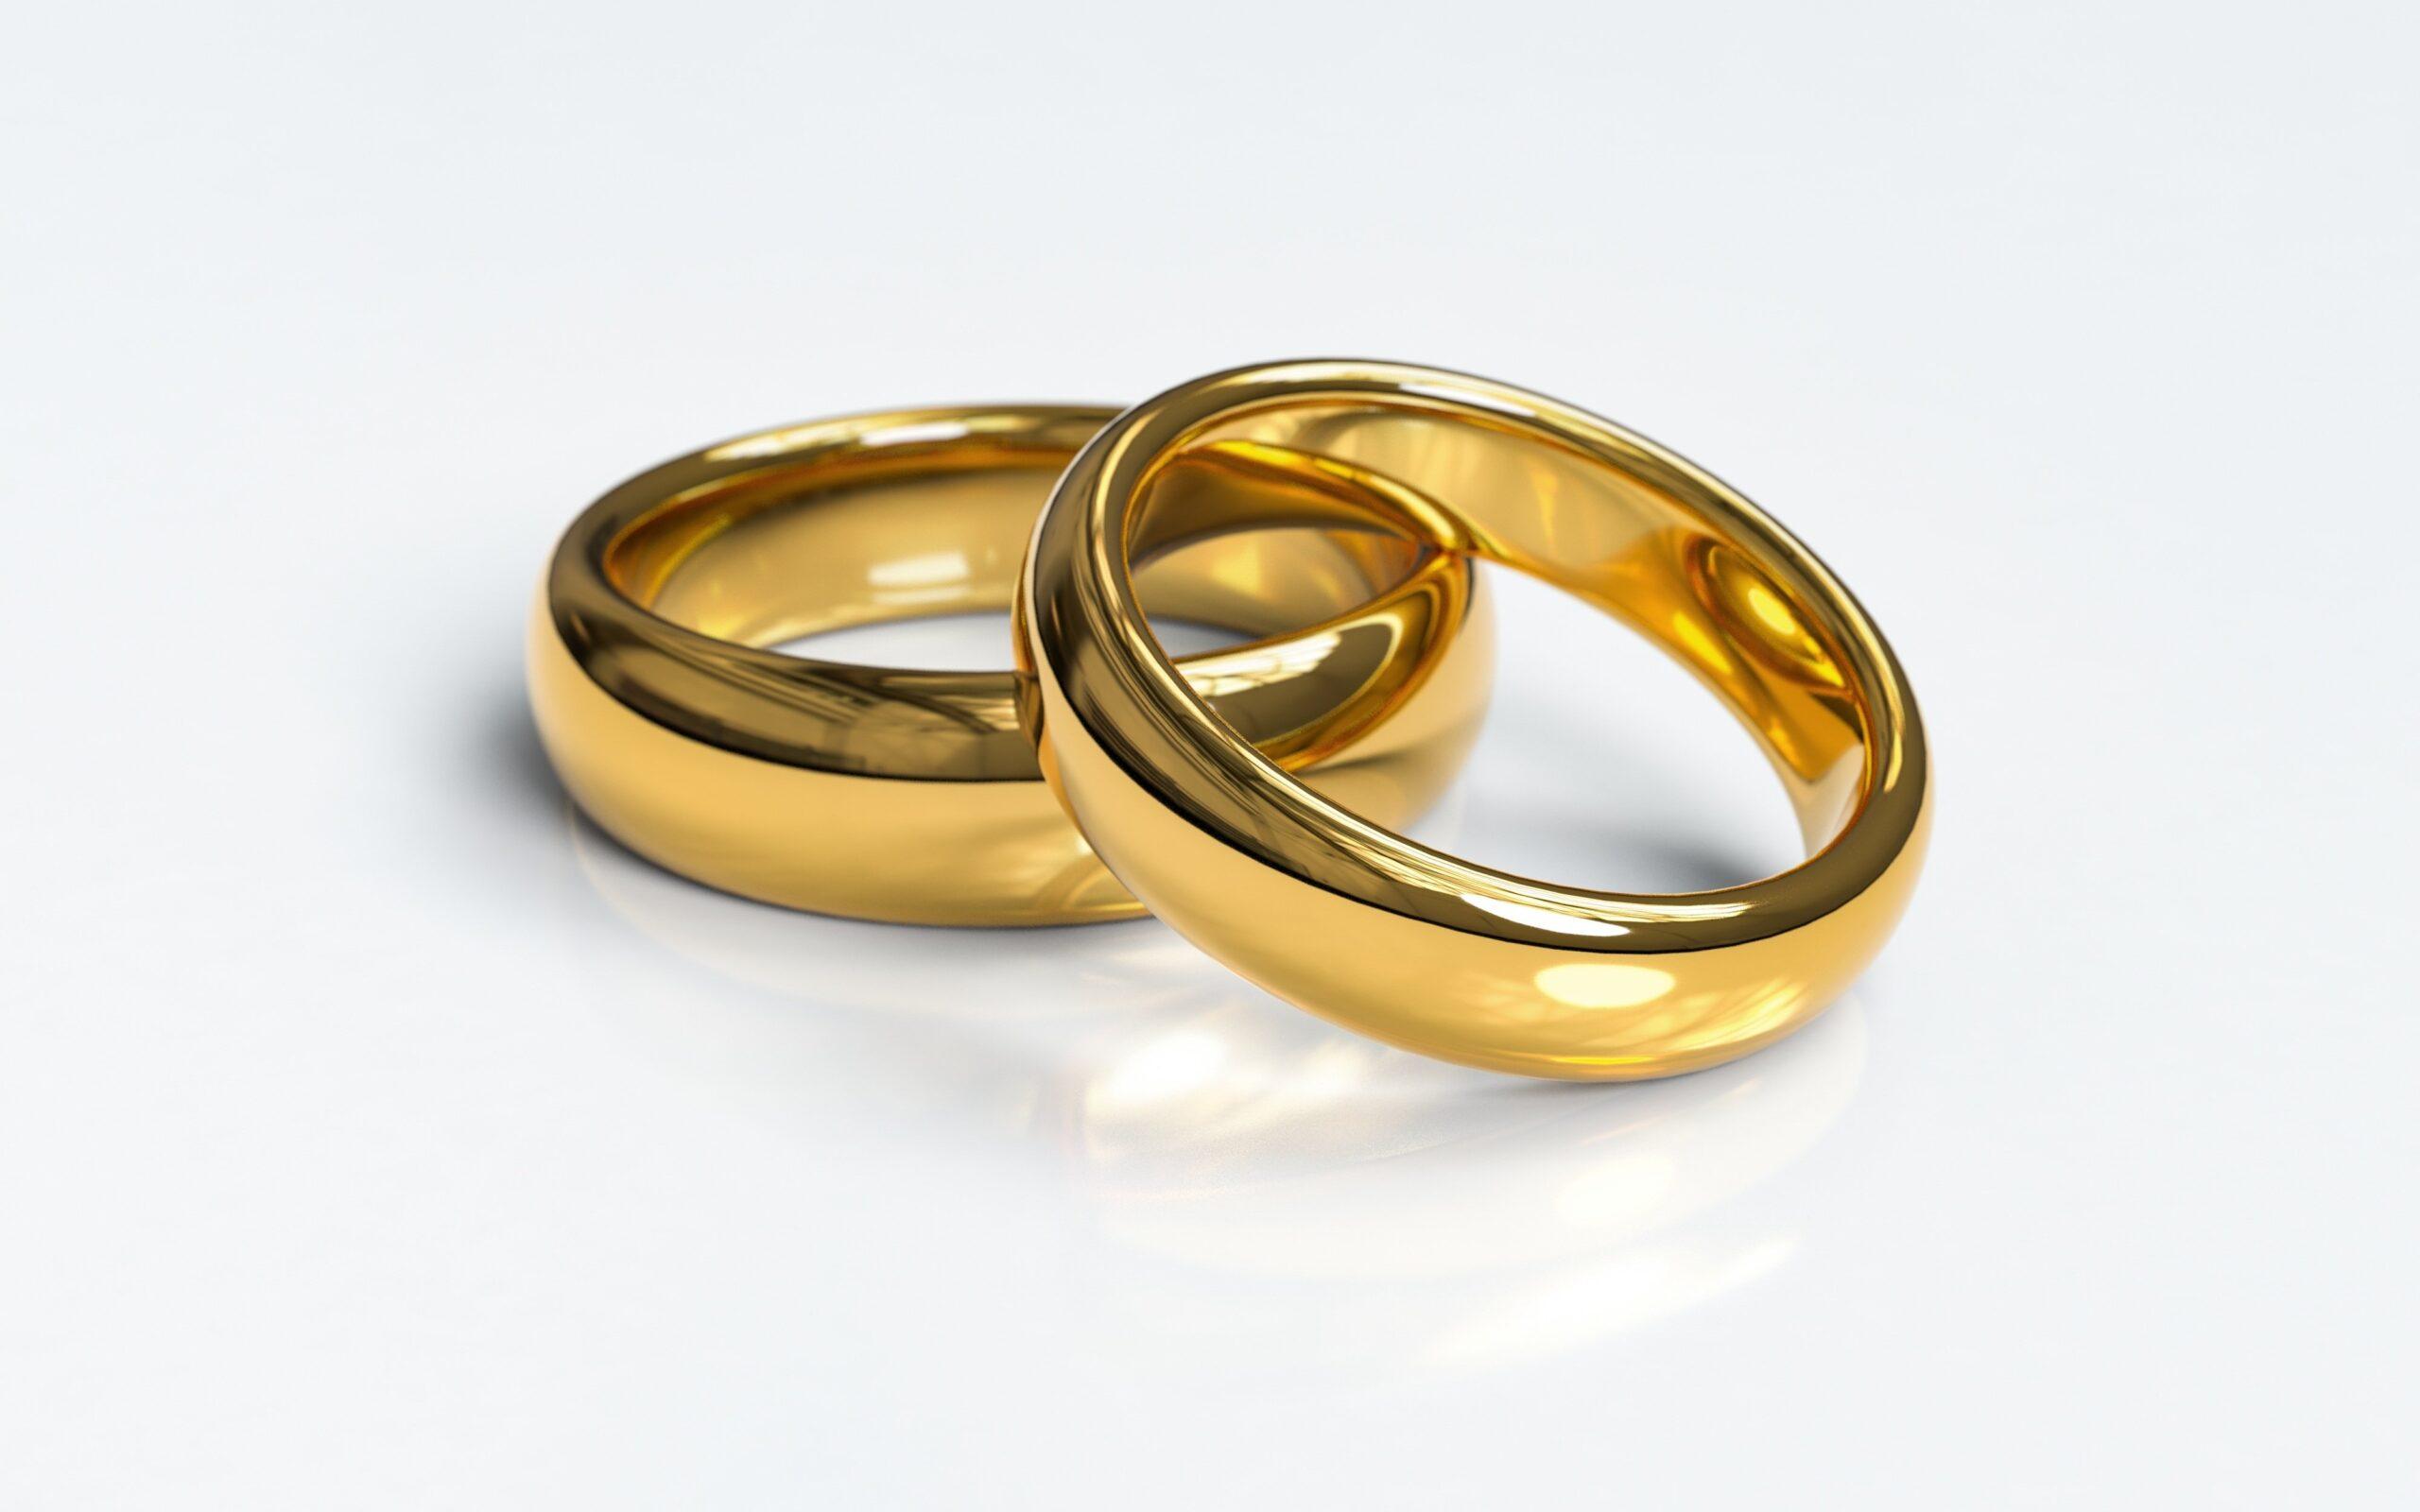 O casamento acabou… Qual o reflexo patrimonial?